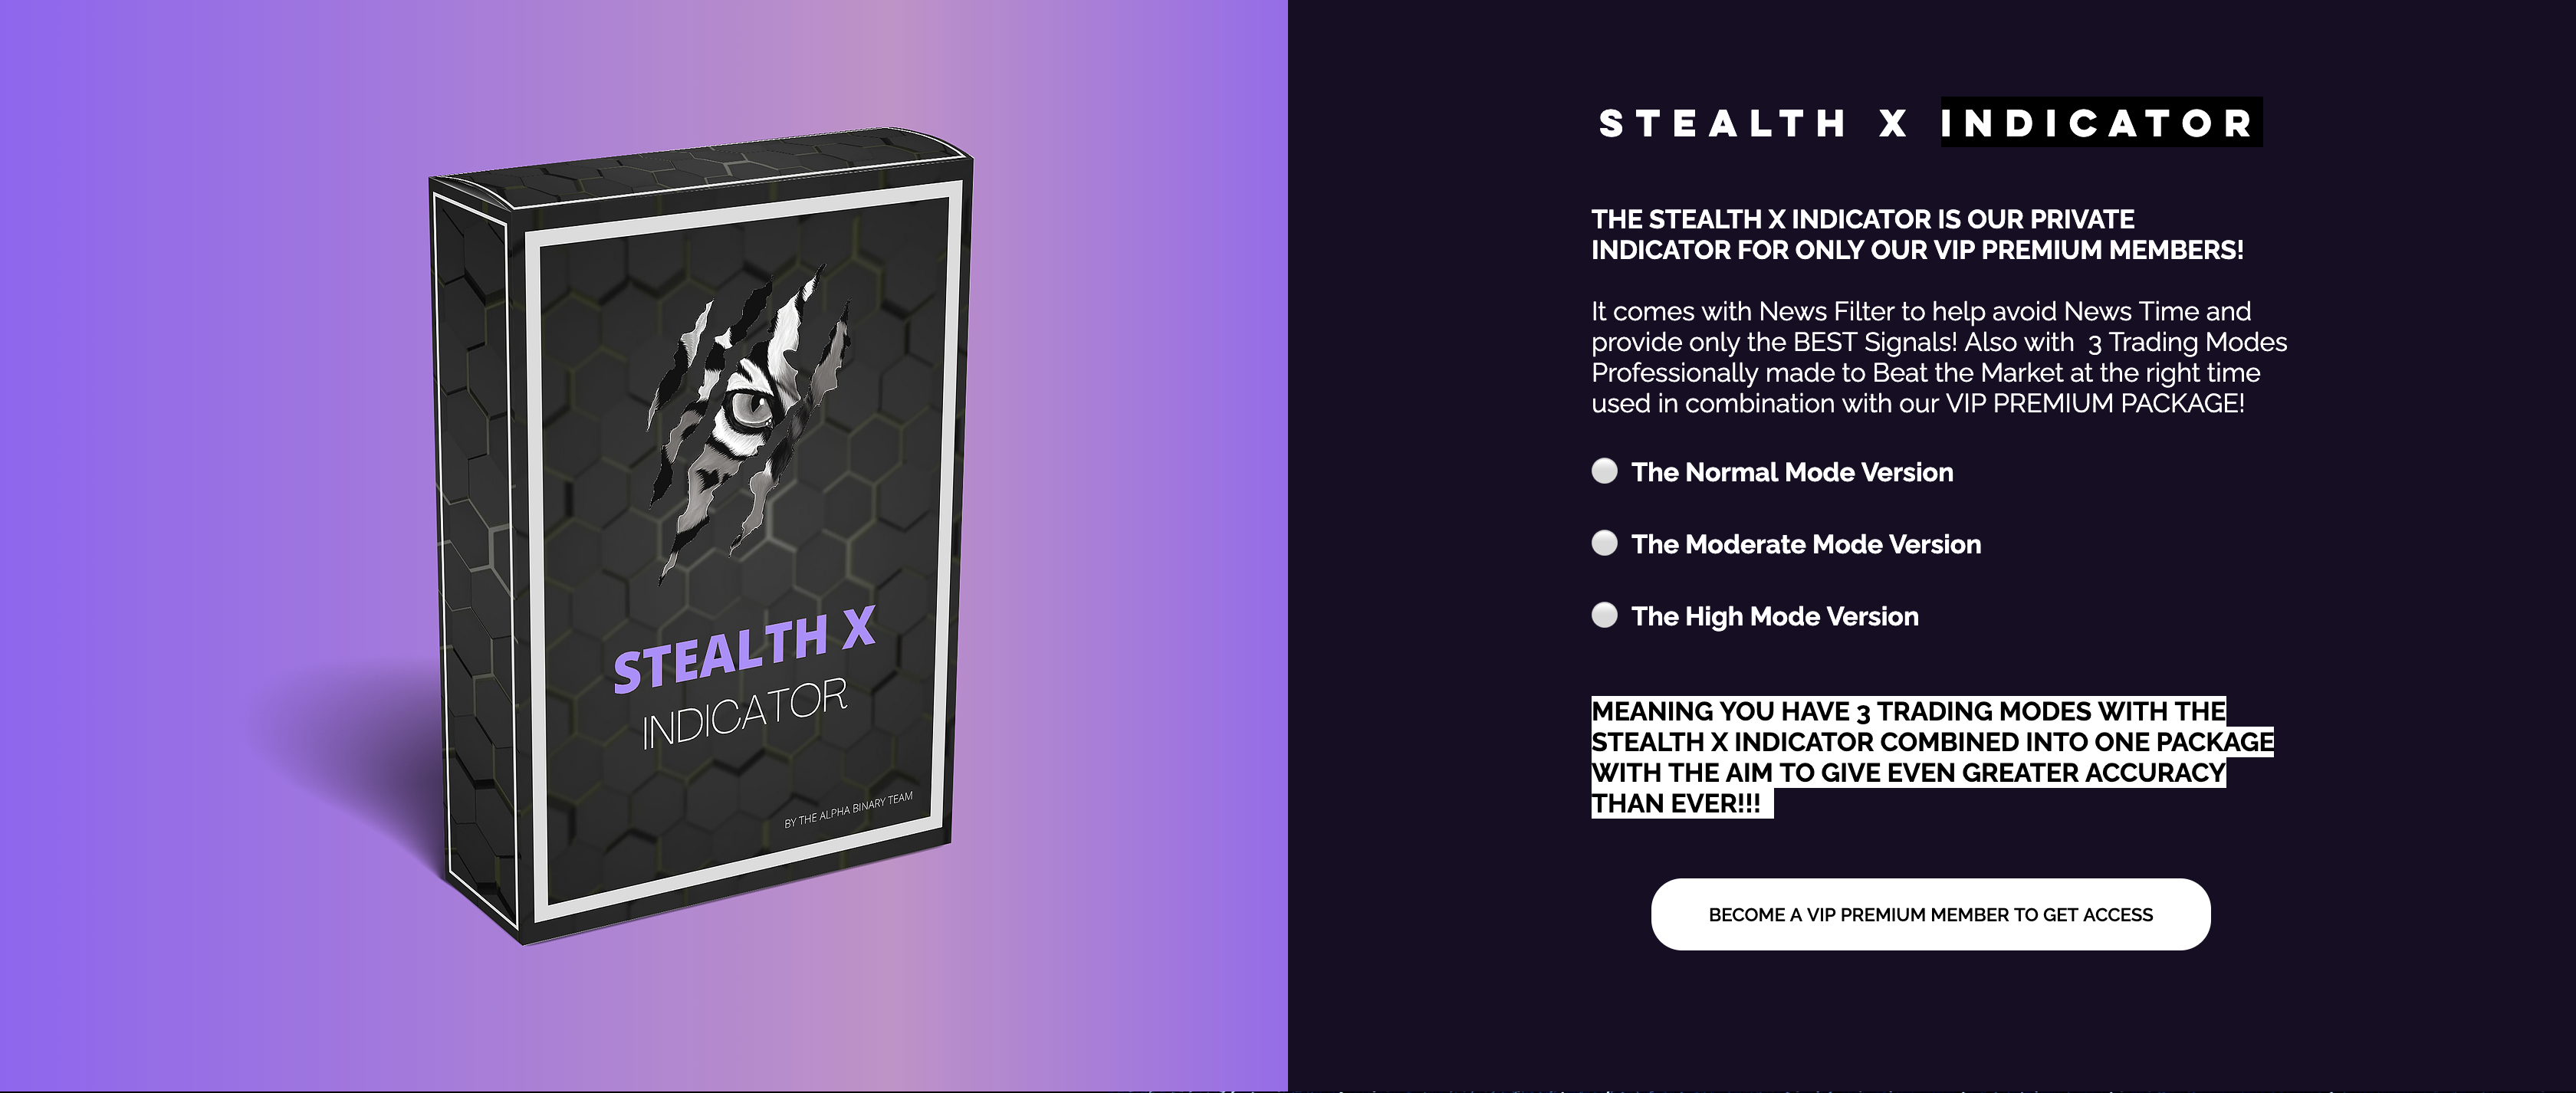 Stealth X Indicator - Alpha Binary Team